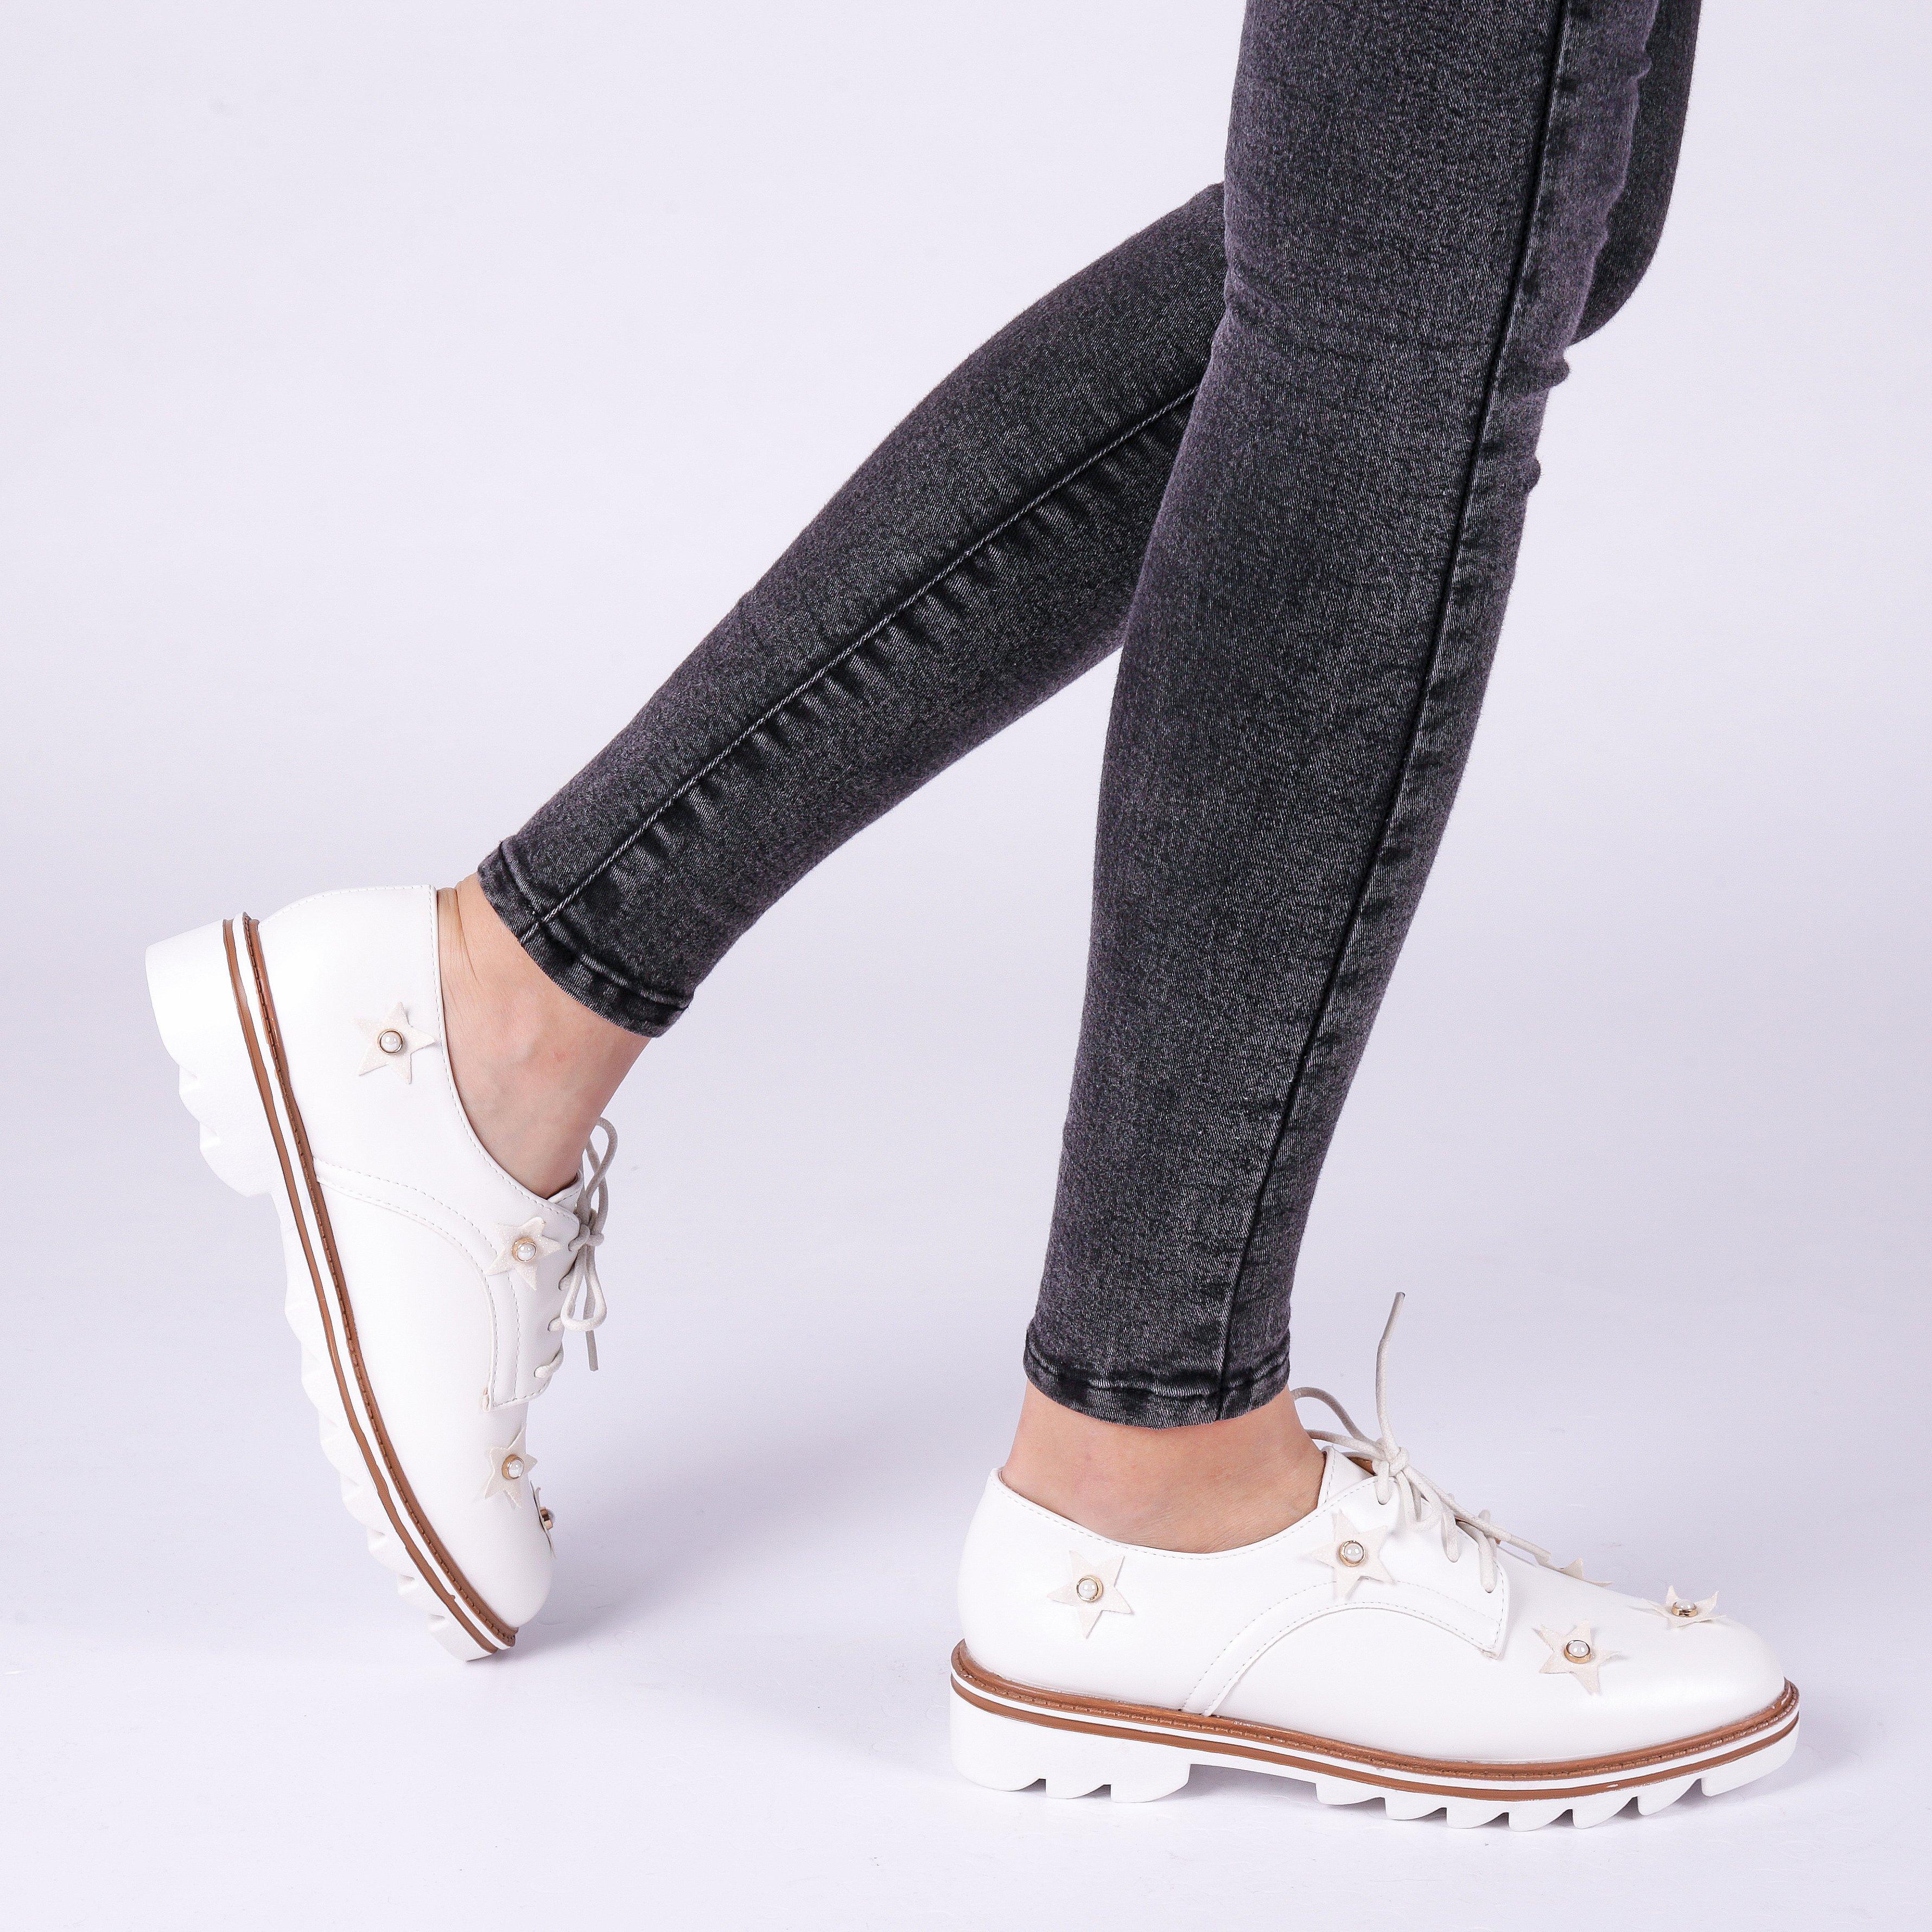 Pantofi dama Nunila albi